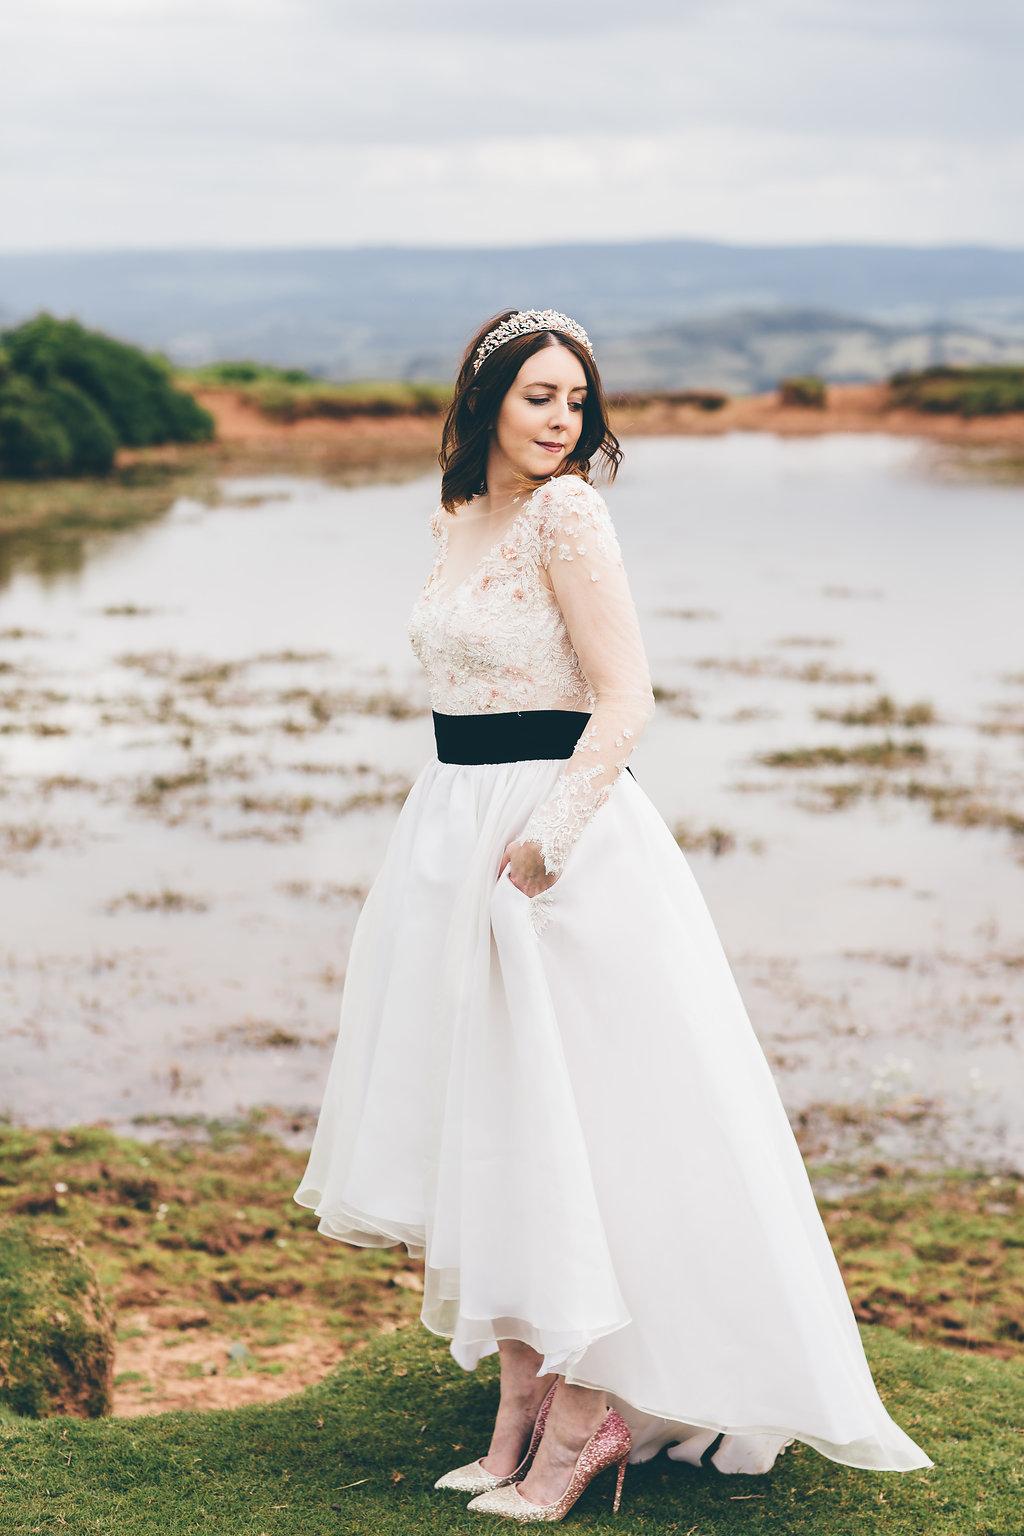 Olivia Palermo inspkired wedding dress, Bumpkin Betty